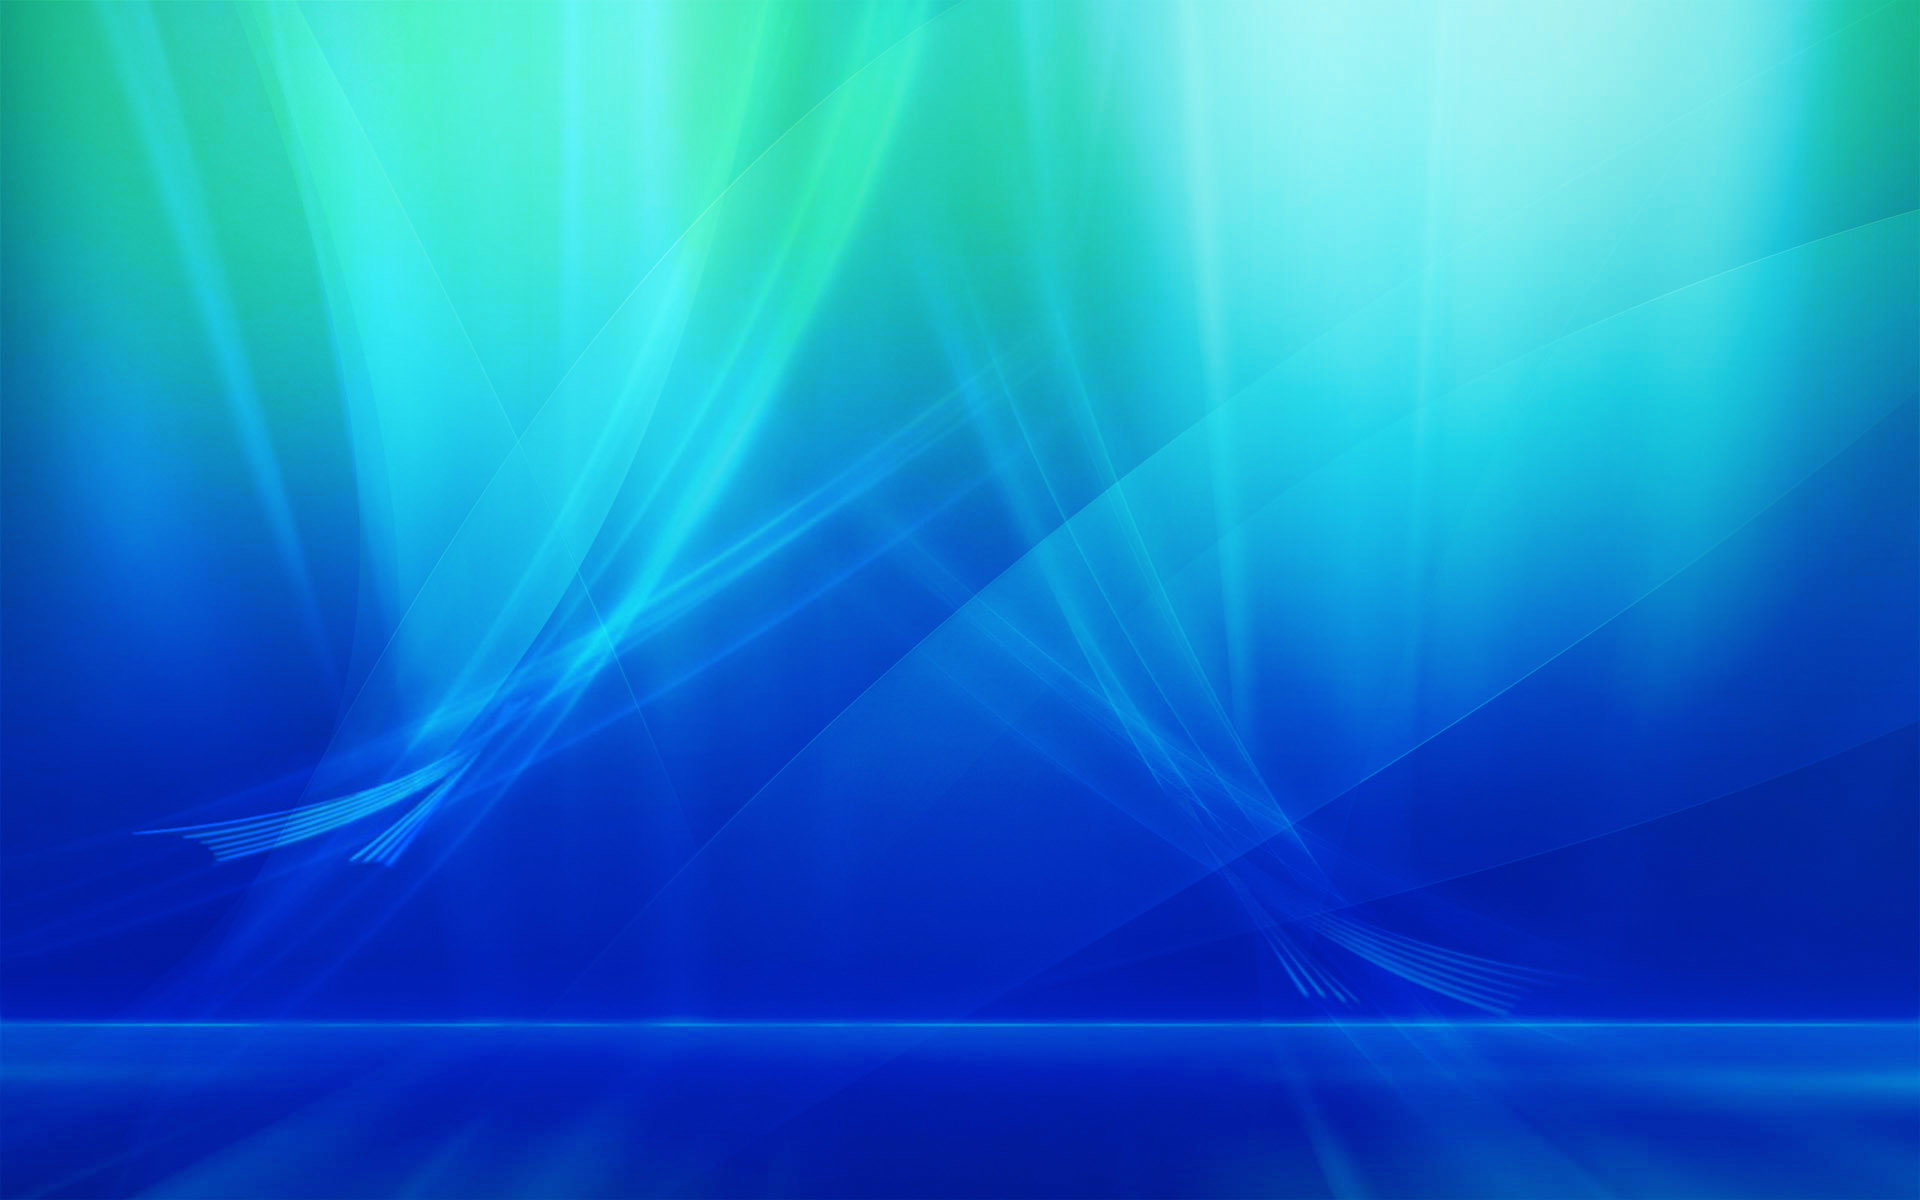 windows vista desktop backgrounds (46+ pictures)